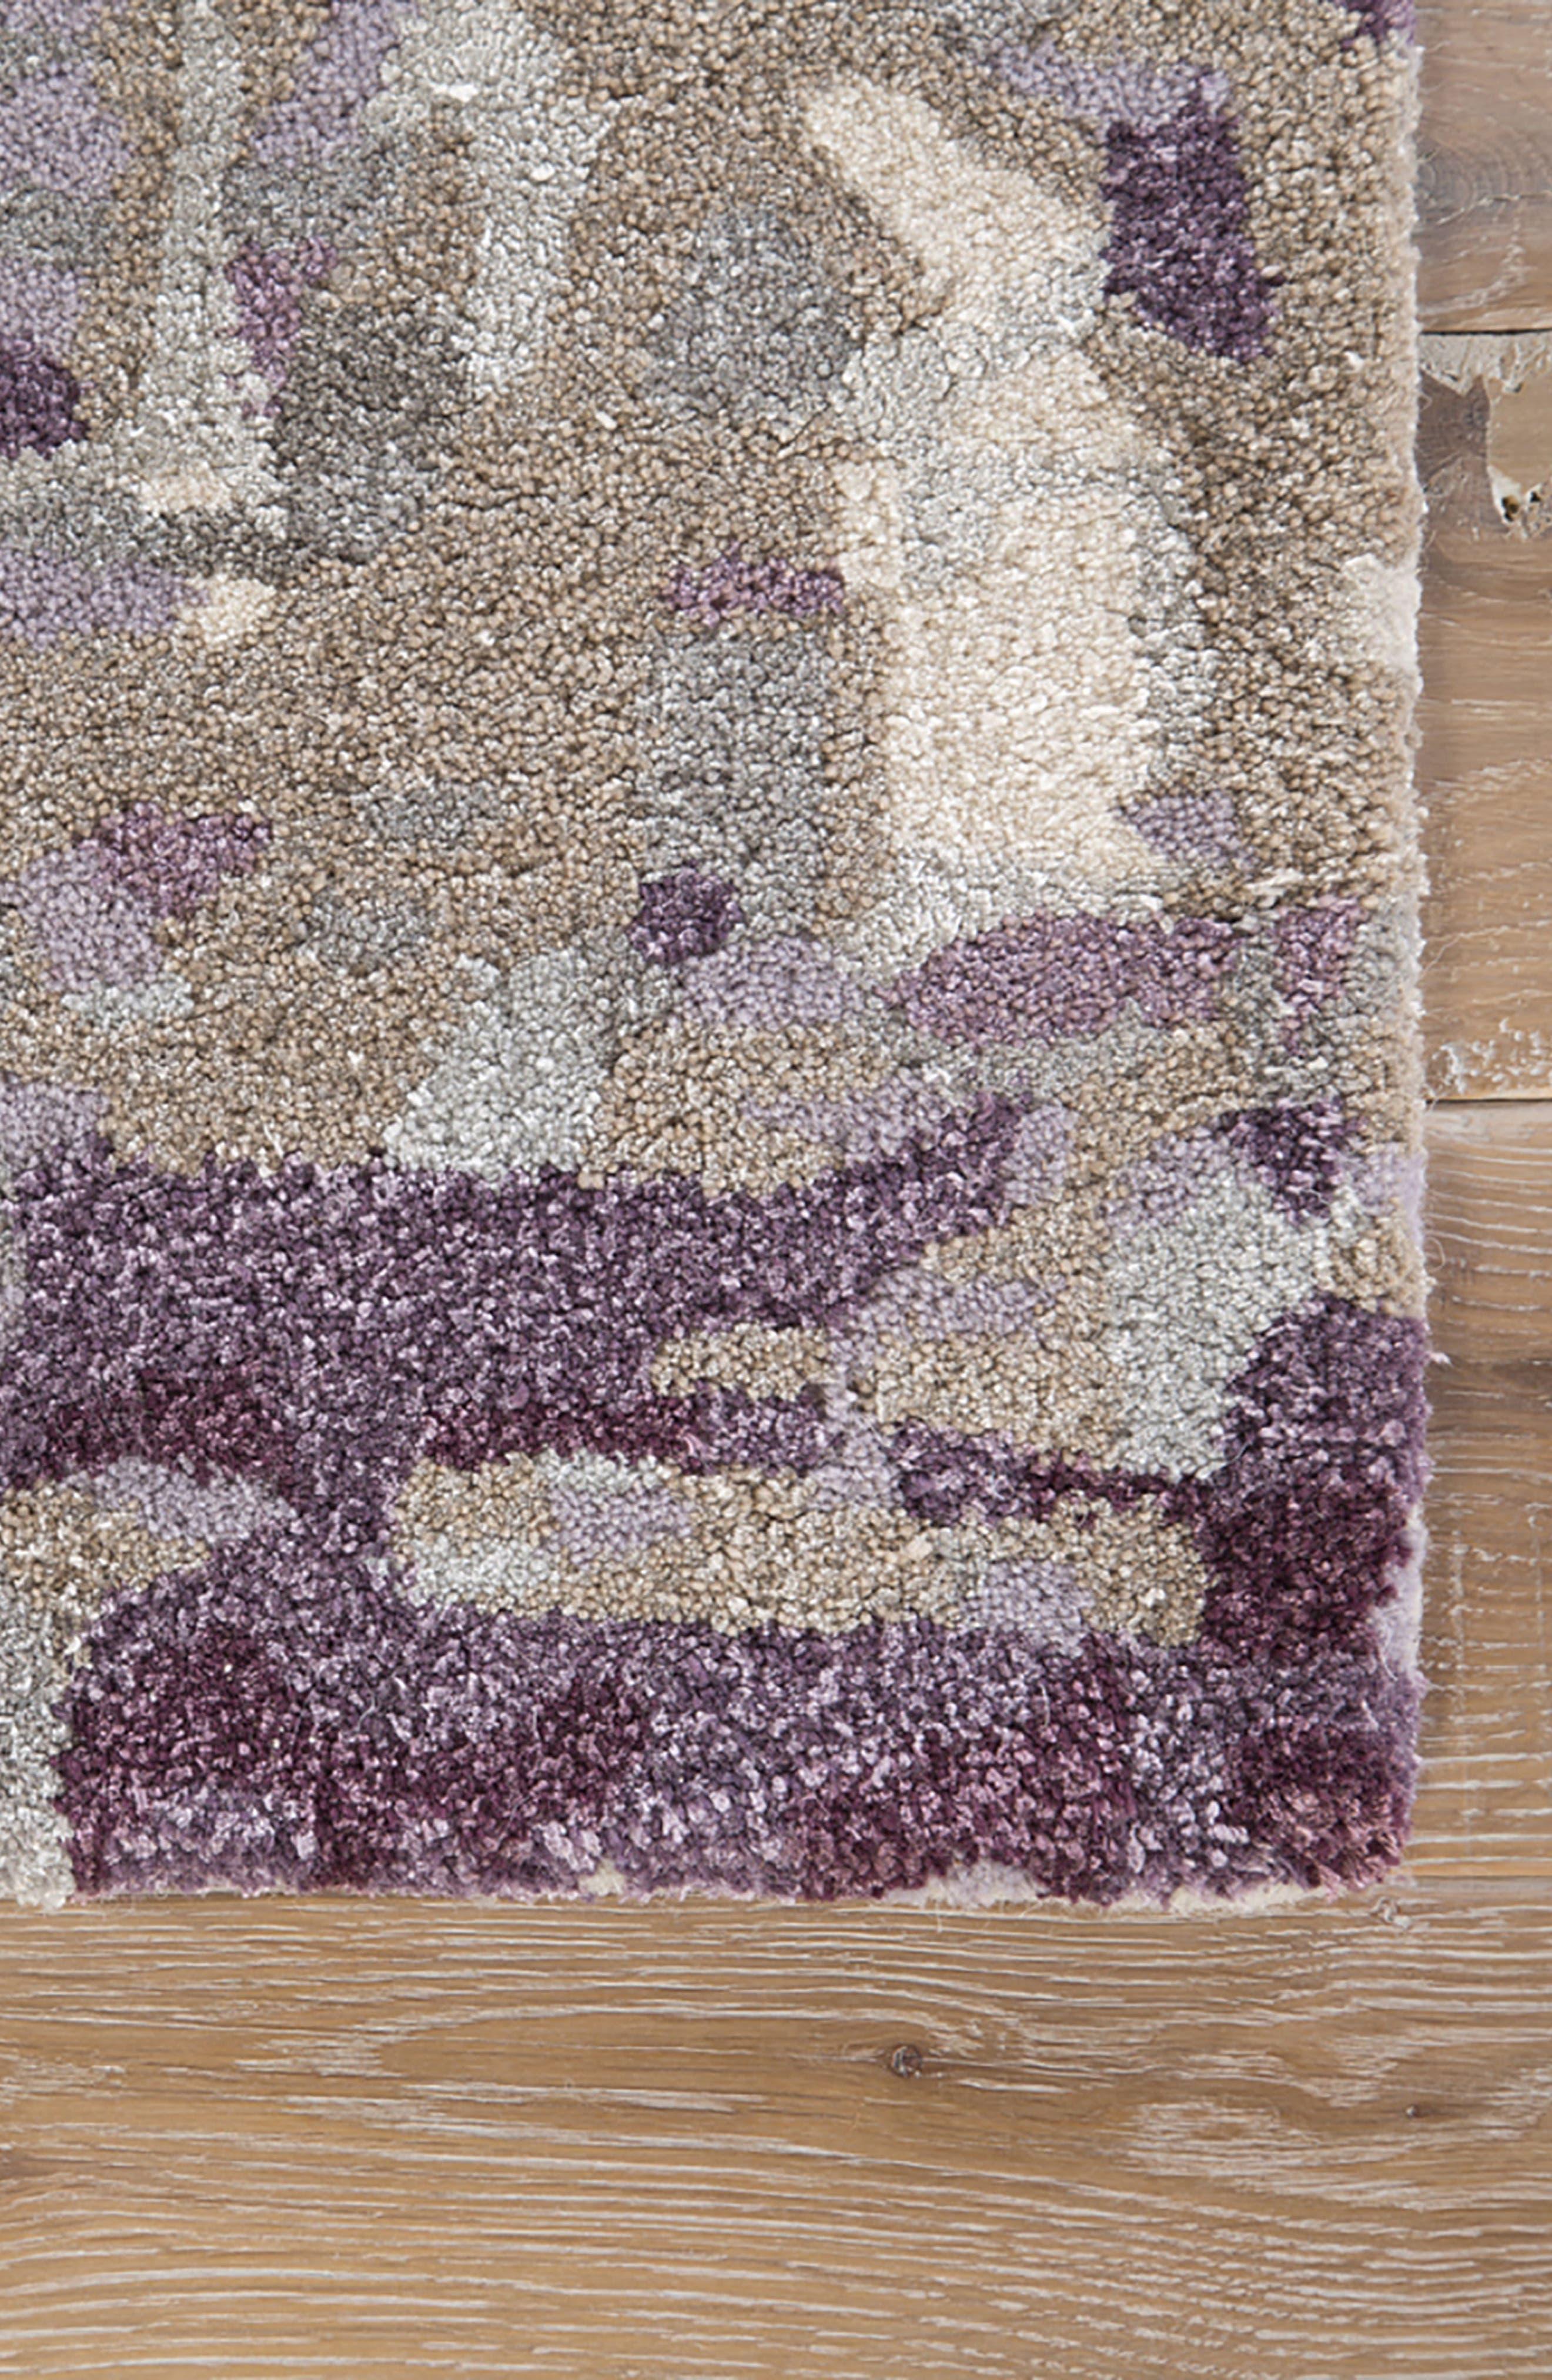 Genesis - Matcha Hand Tufted Rug,                             Alternate thumbnail 2, color,                             Pumice Stone